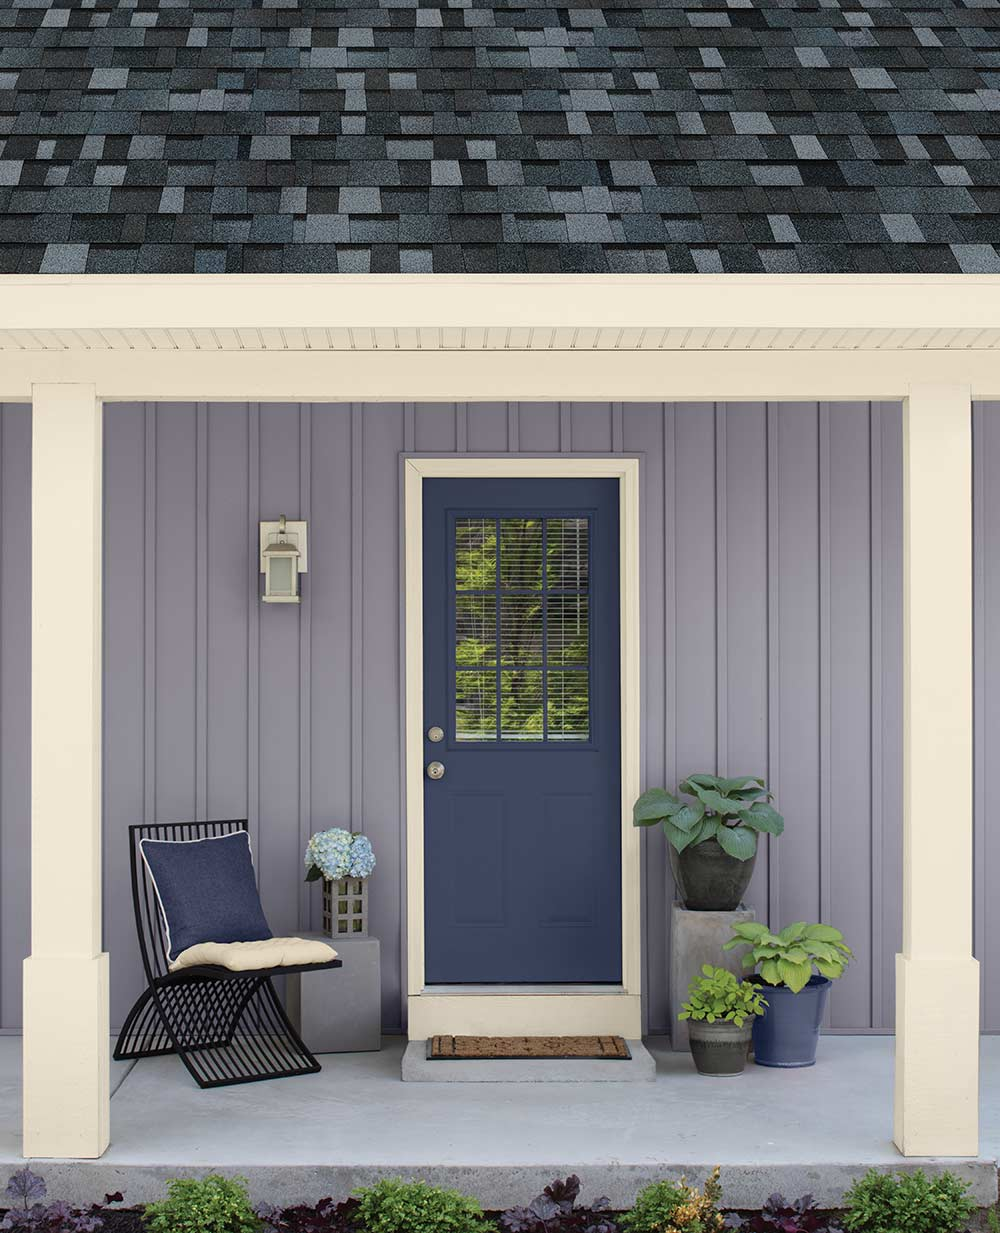 Pacific wave lilac gray porch desktop wide@2x eee4f02b70fe09d1d8297a3a77a3736aad6aecdefb61a6a1cf84a006b795904c